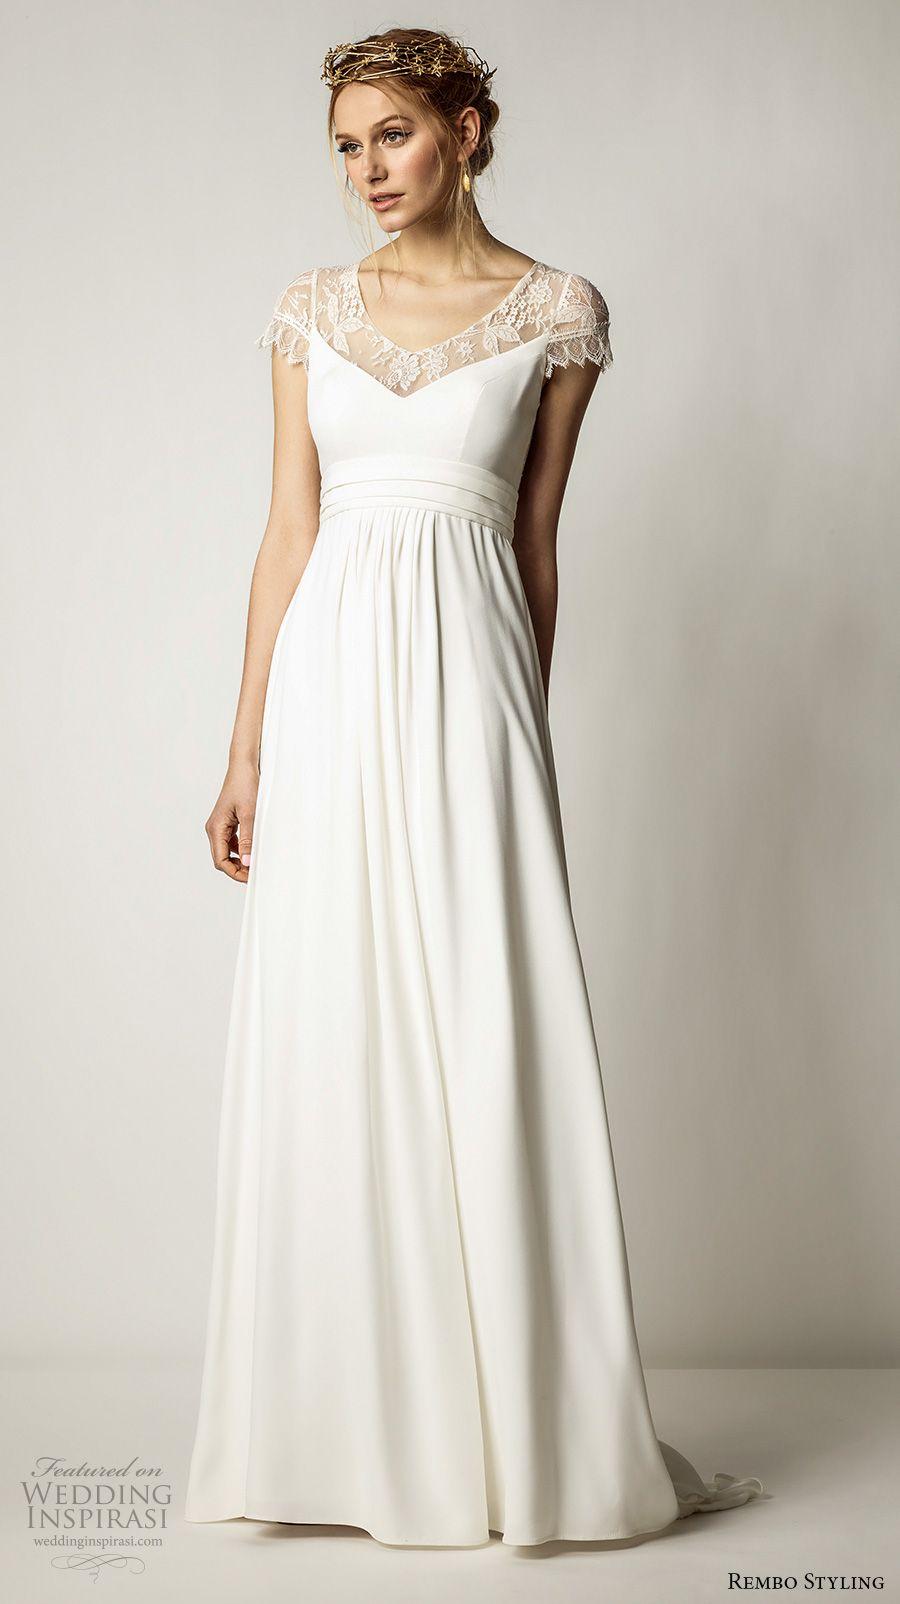 Rembo styling wedding dresses wedding pinterest wedding